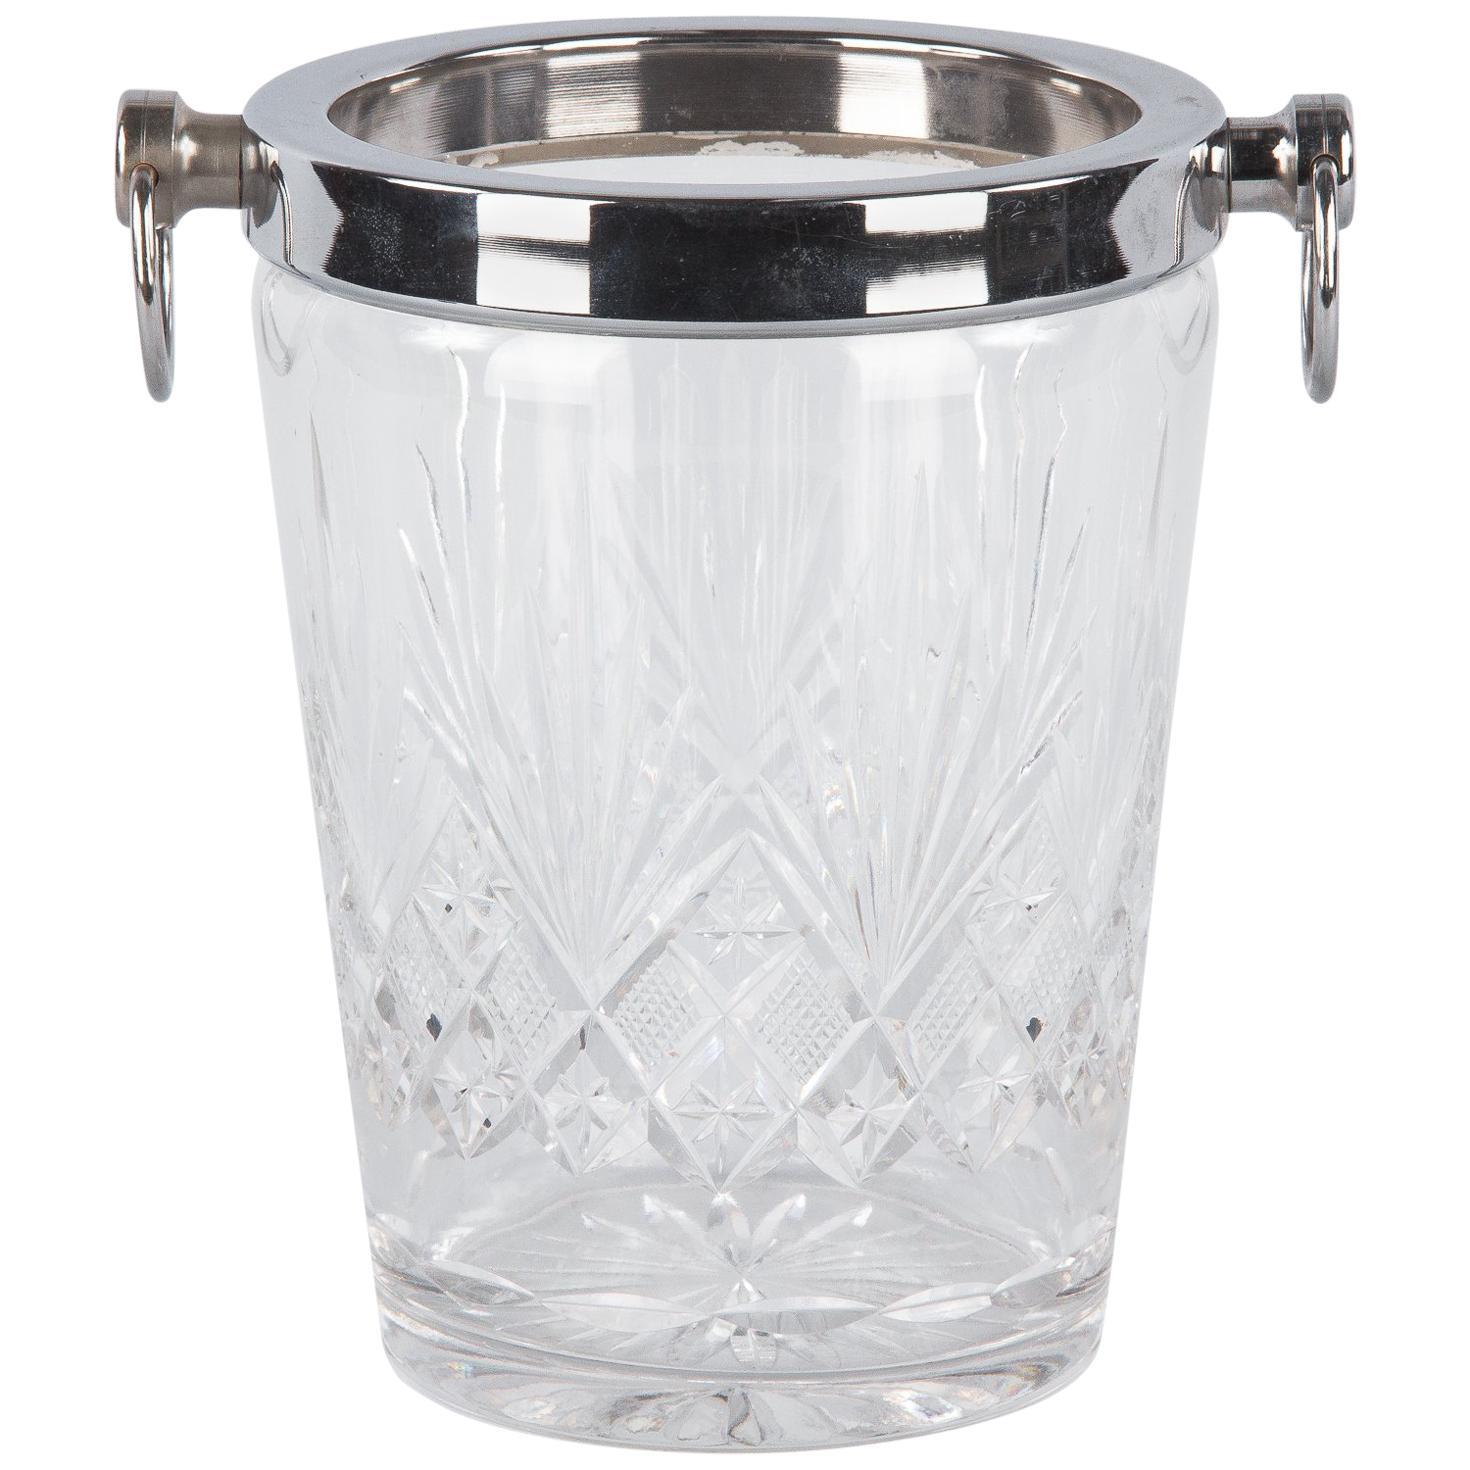 562a3da4c43 Antique and Vintage Glass